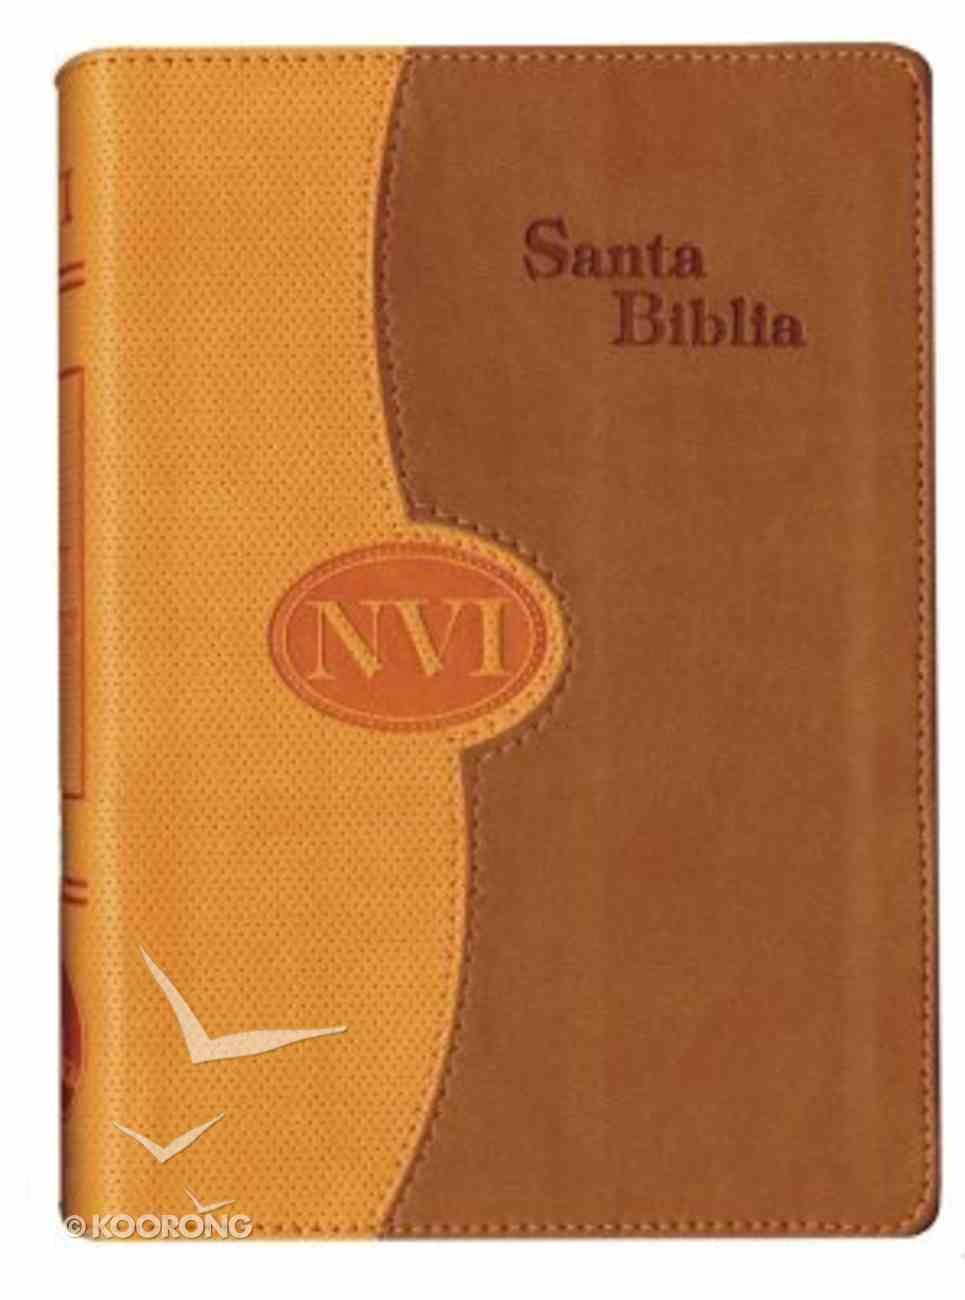 Nvi Santa Biblia Bicentenario/Nvi Duo-Tone Orange/Tan Imitation Leather